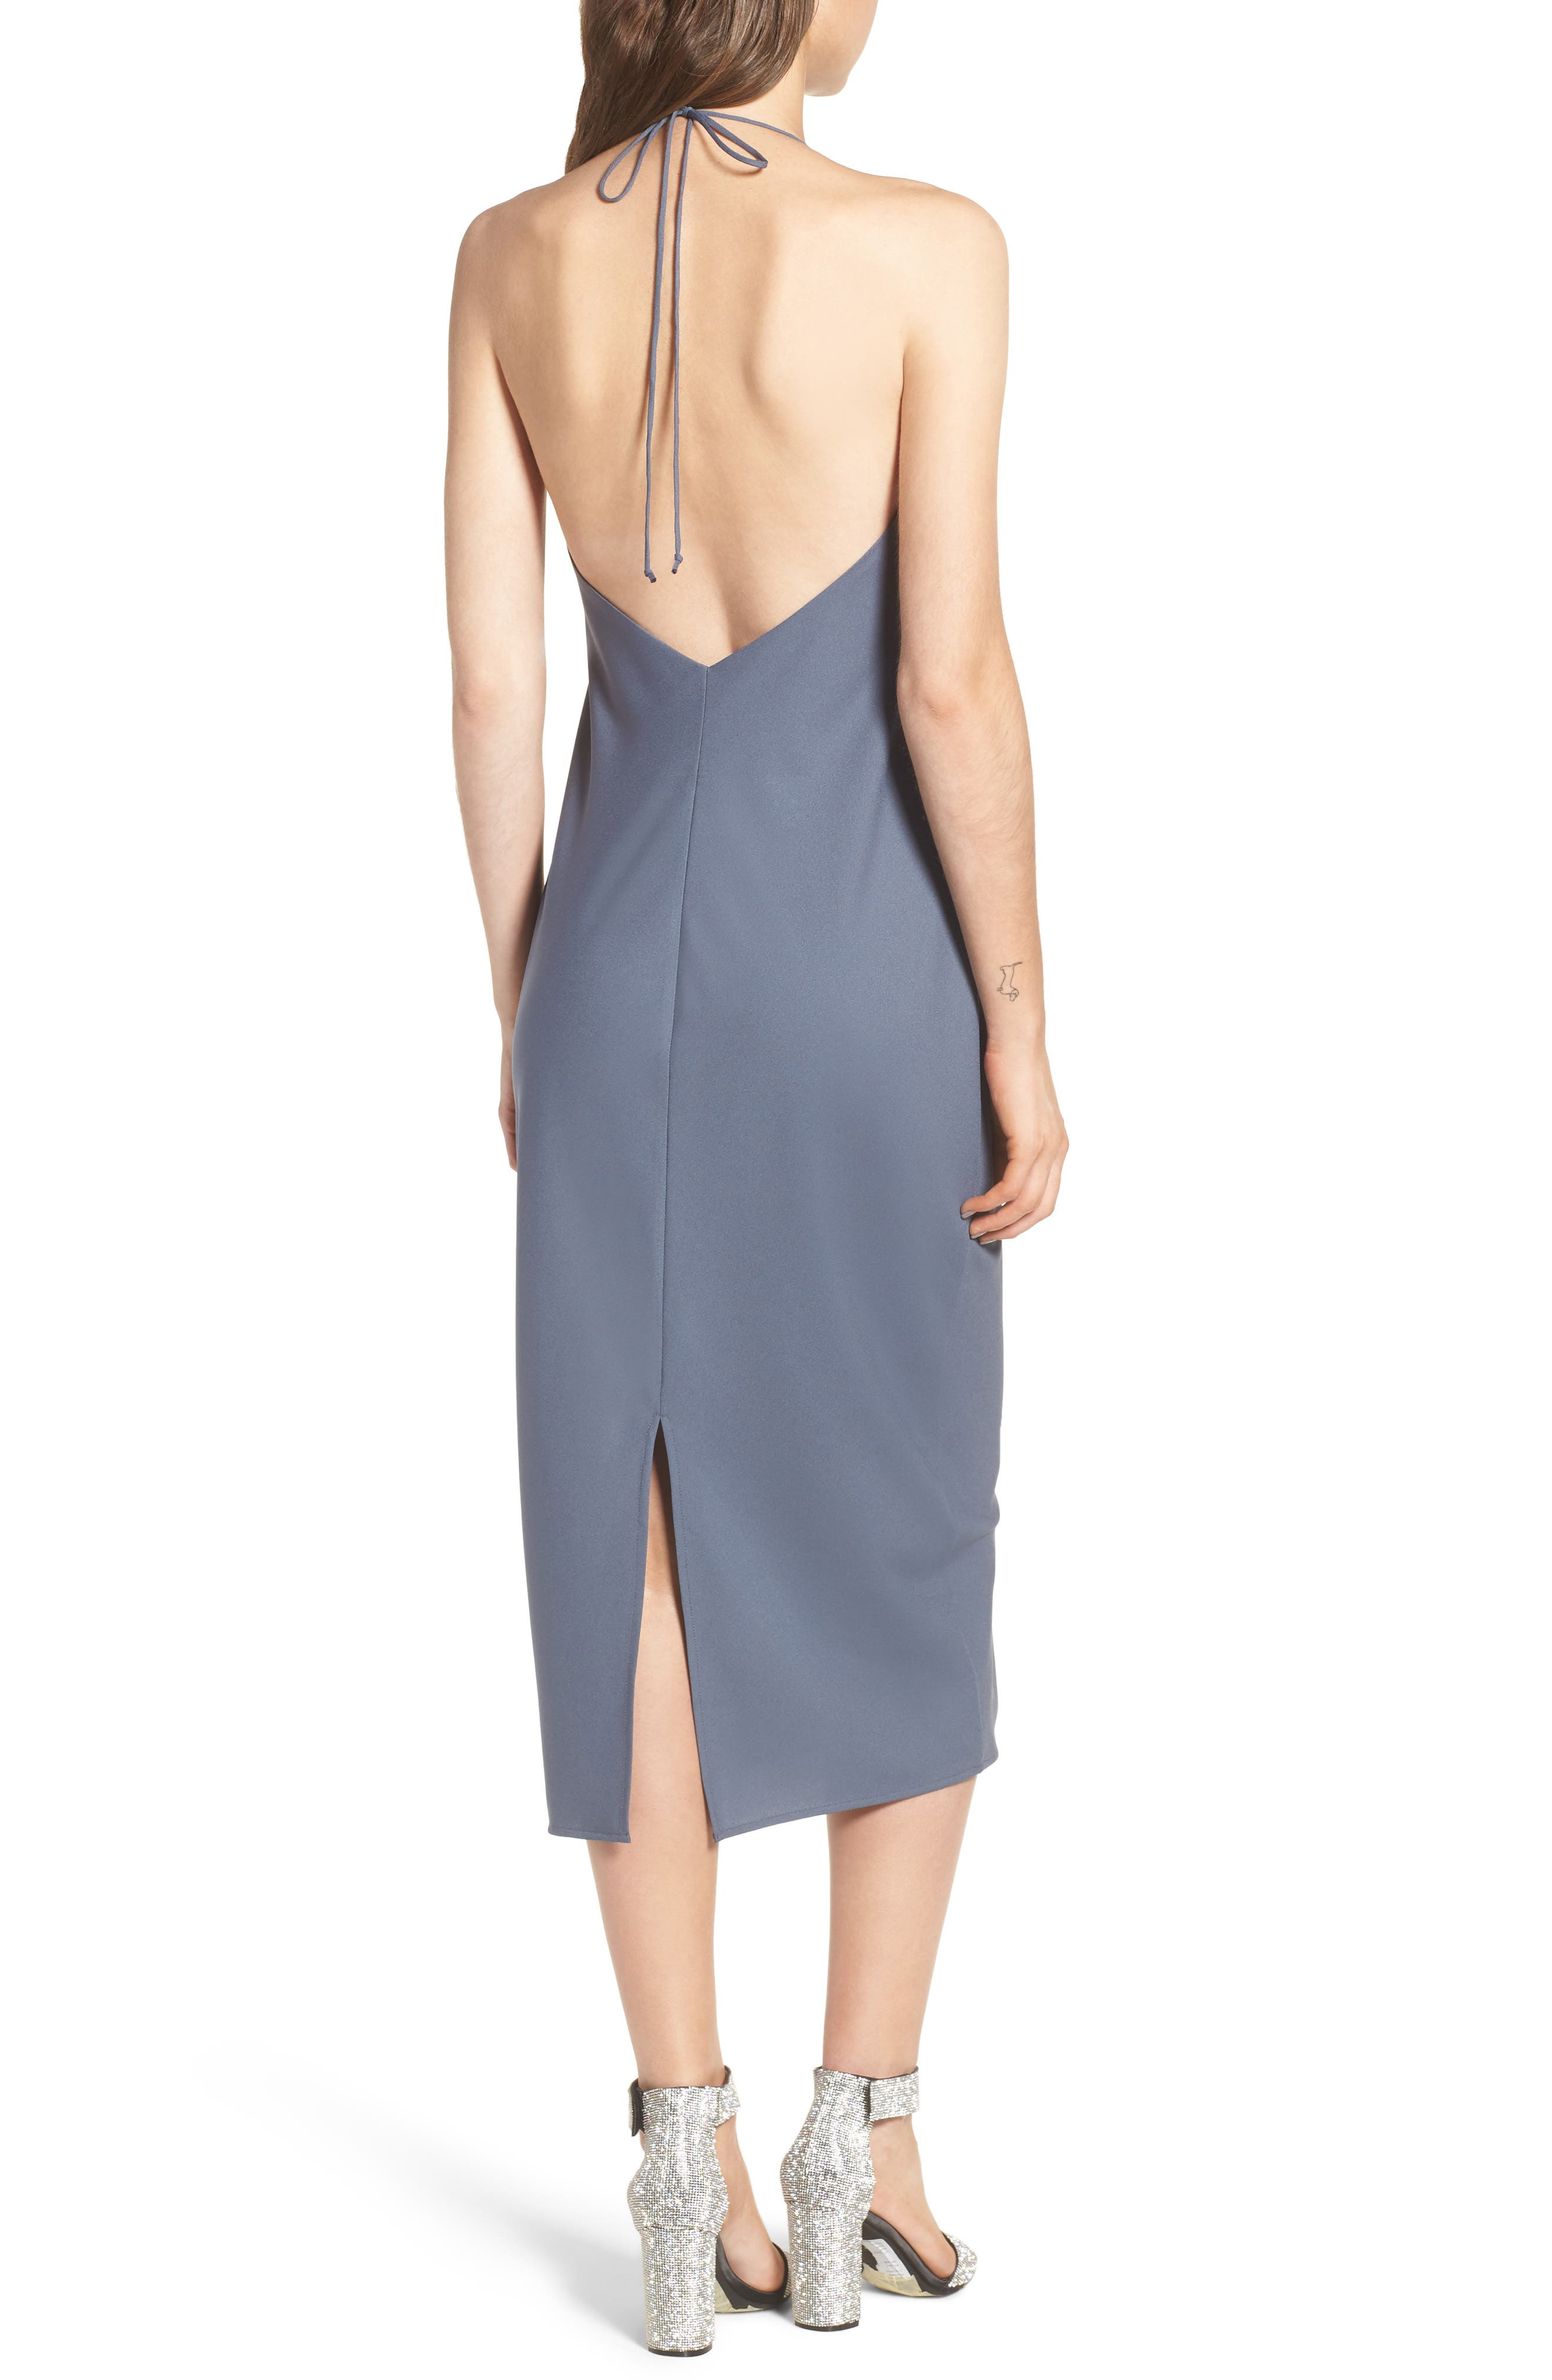 Cowl Neck Midi Dress,                             Alternate thumbnail 2, color,                             Grey Grisaille